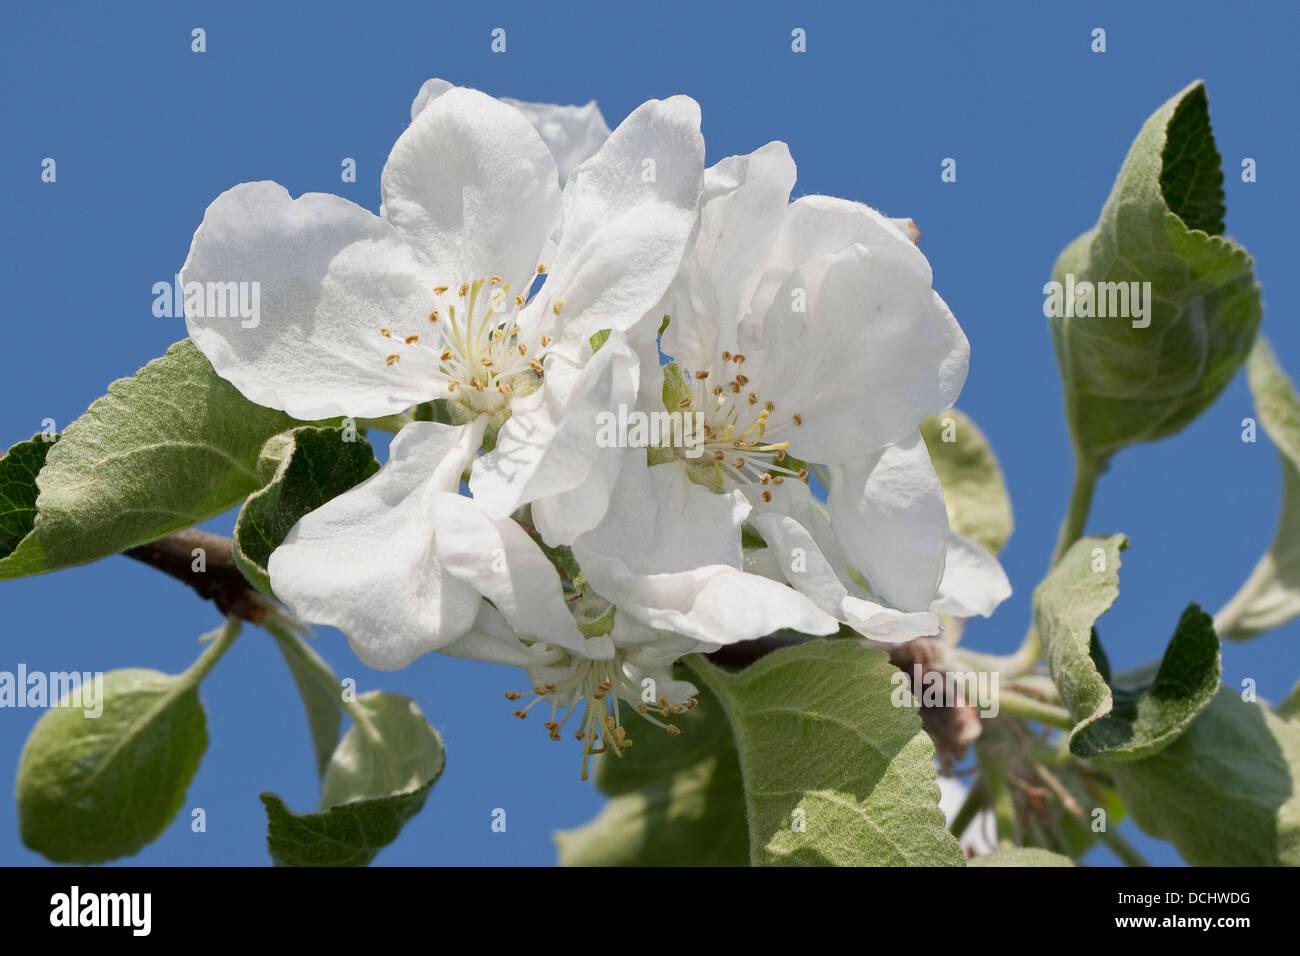 Apple, fruit tree, fruit-bearing tree, Kultur-Apfel, Apfelbaum, Obst, Obstbaum, Apfelblüte, Malus domestica, - Stock Image